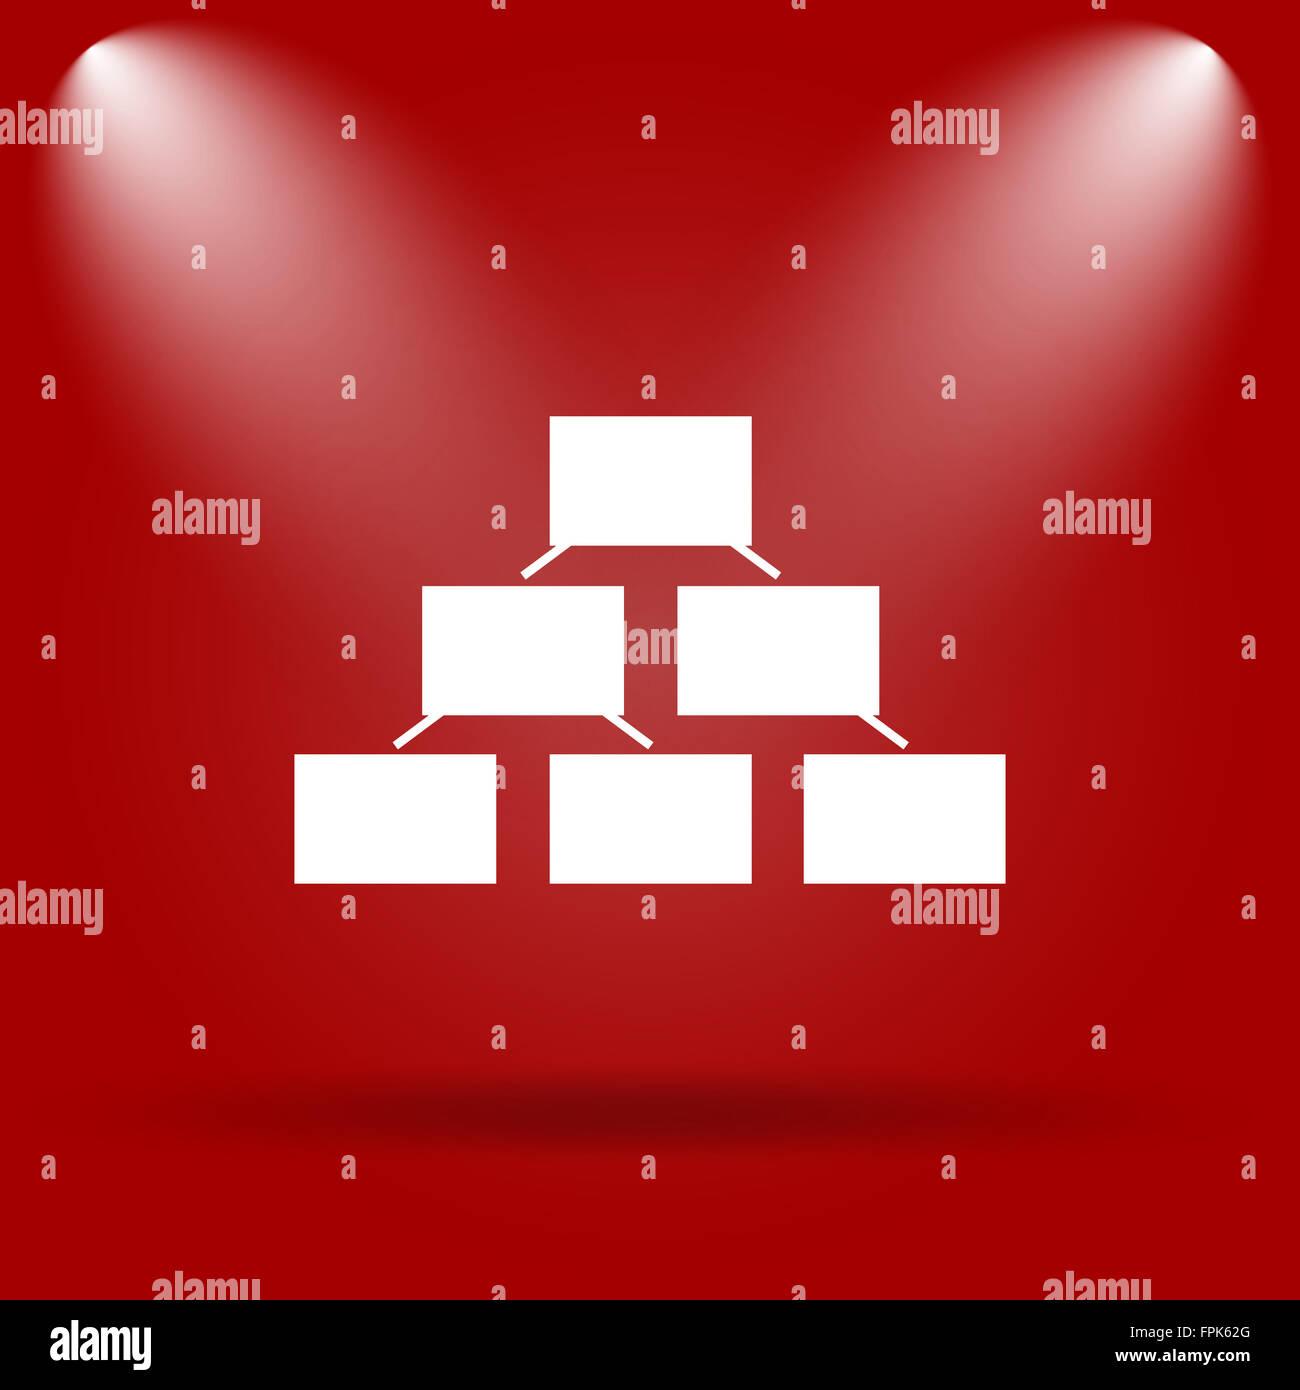 Organigramm-Symbol. Flache Symbol auf rotem Grund Stockfoto, Bild ...